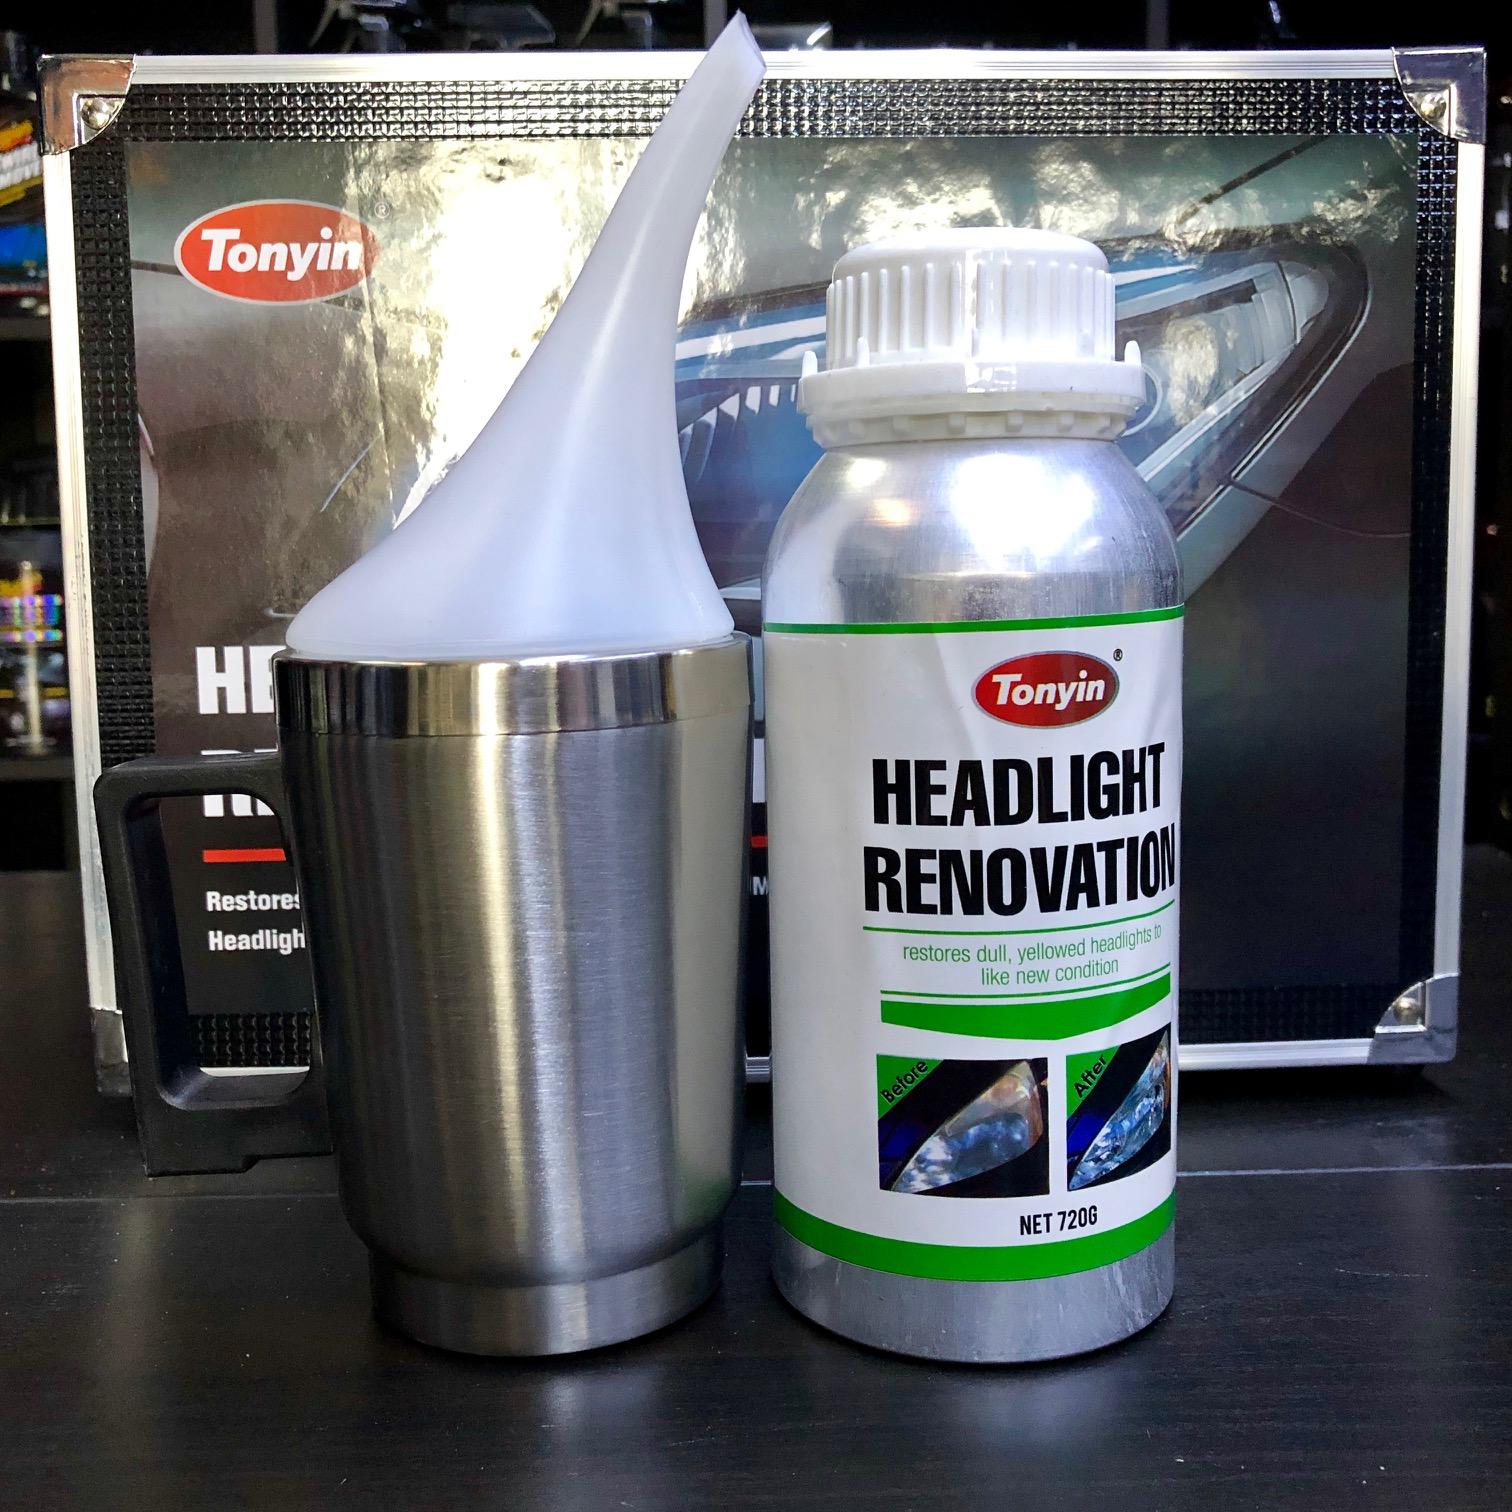 Tonyin Headlight Renovation Kit